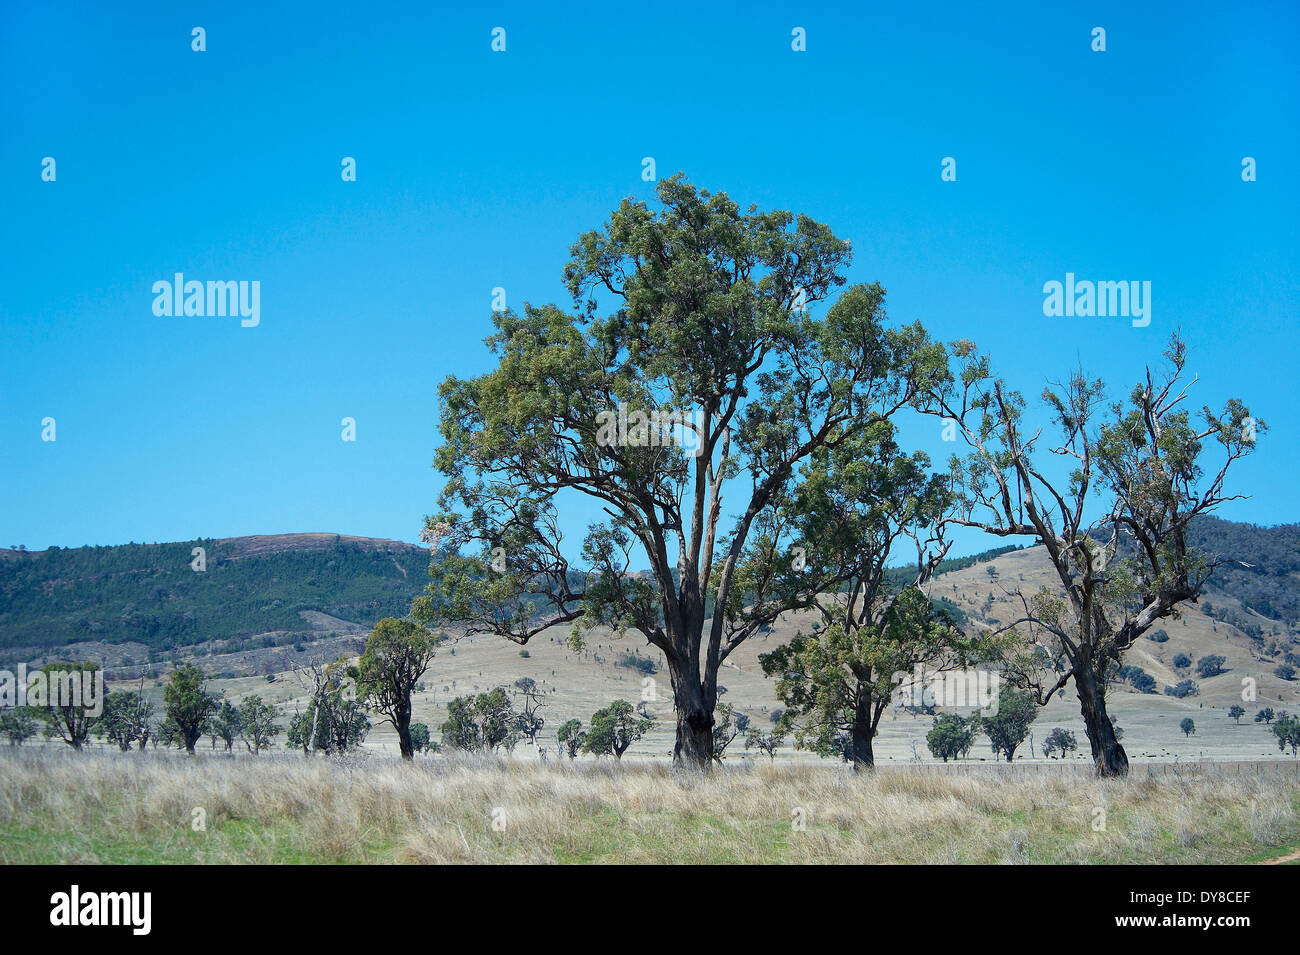 Australia, eucalyptus, karri, Mount Kaputar, national park, New South Wales, plants, trees - Stock Image